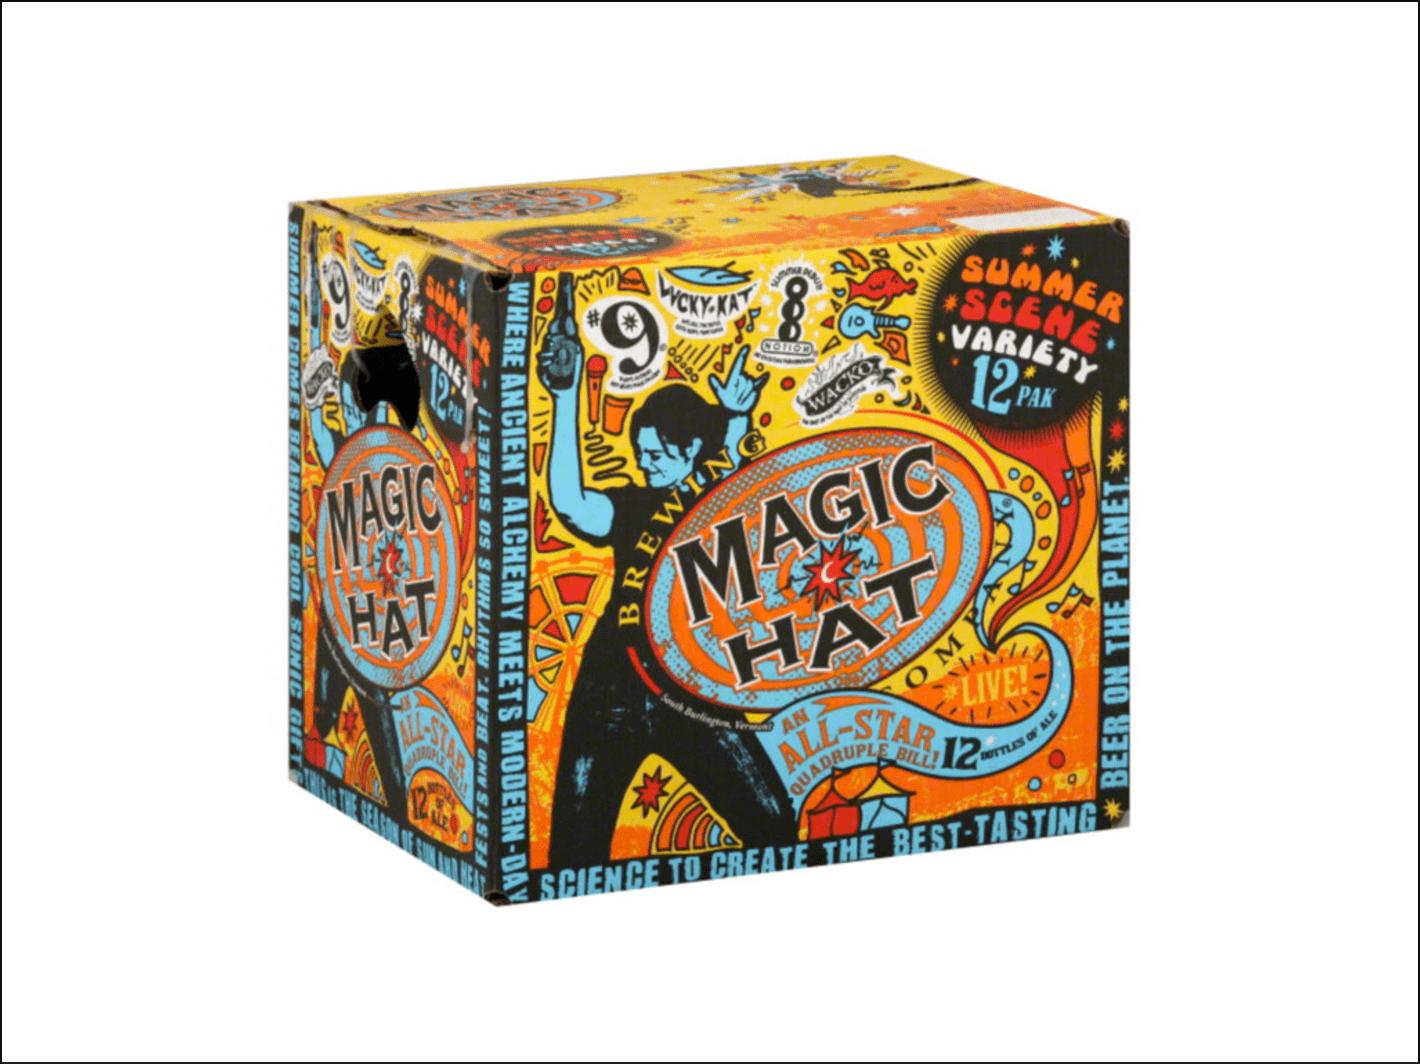 Susan Evans McClure on Magic Hat packaging